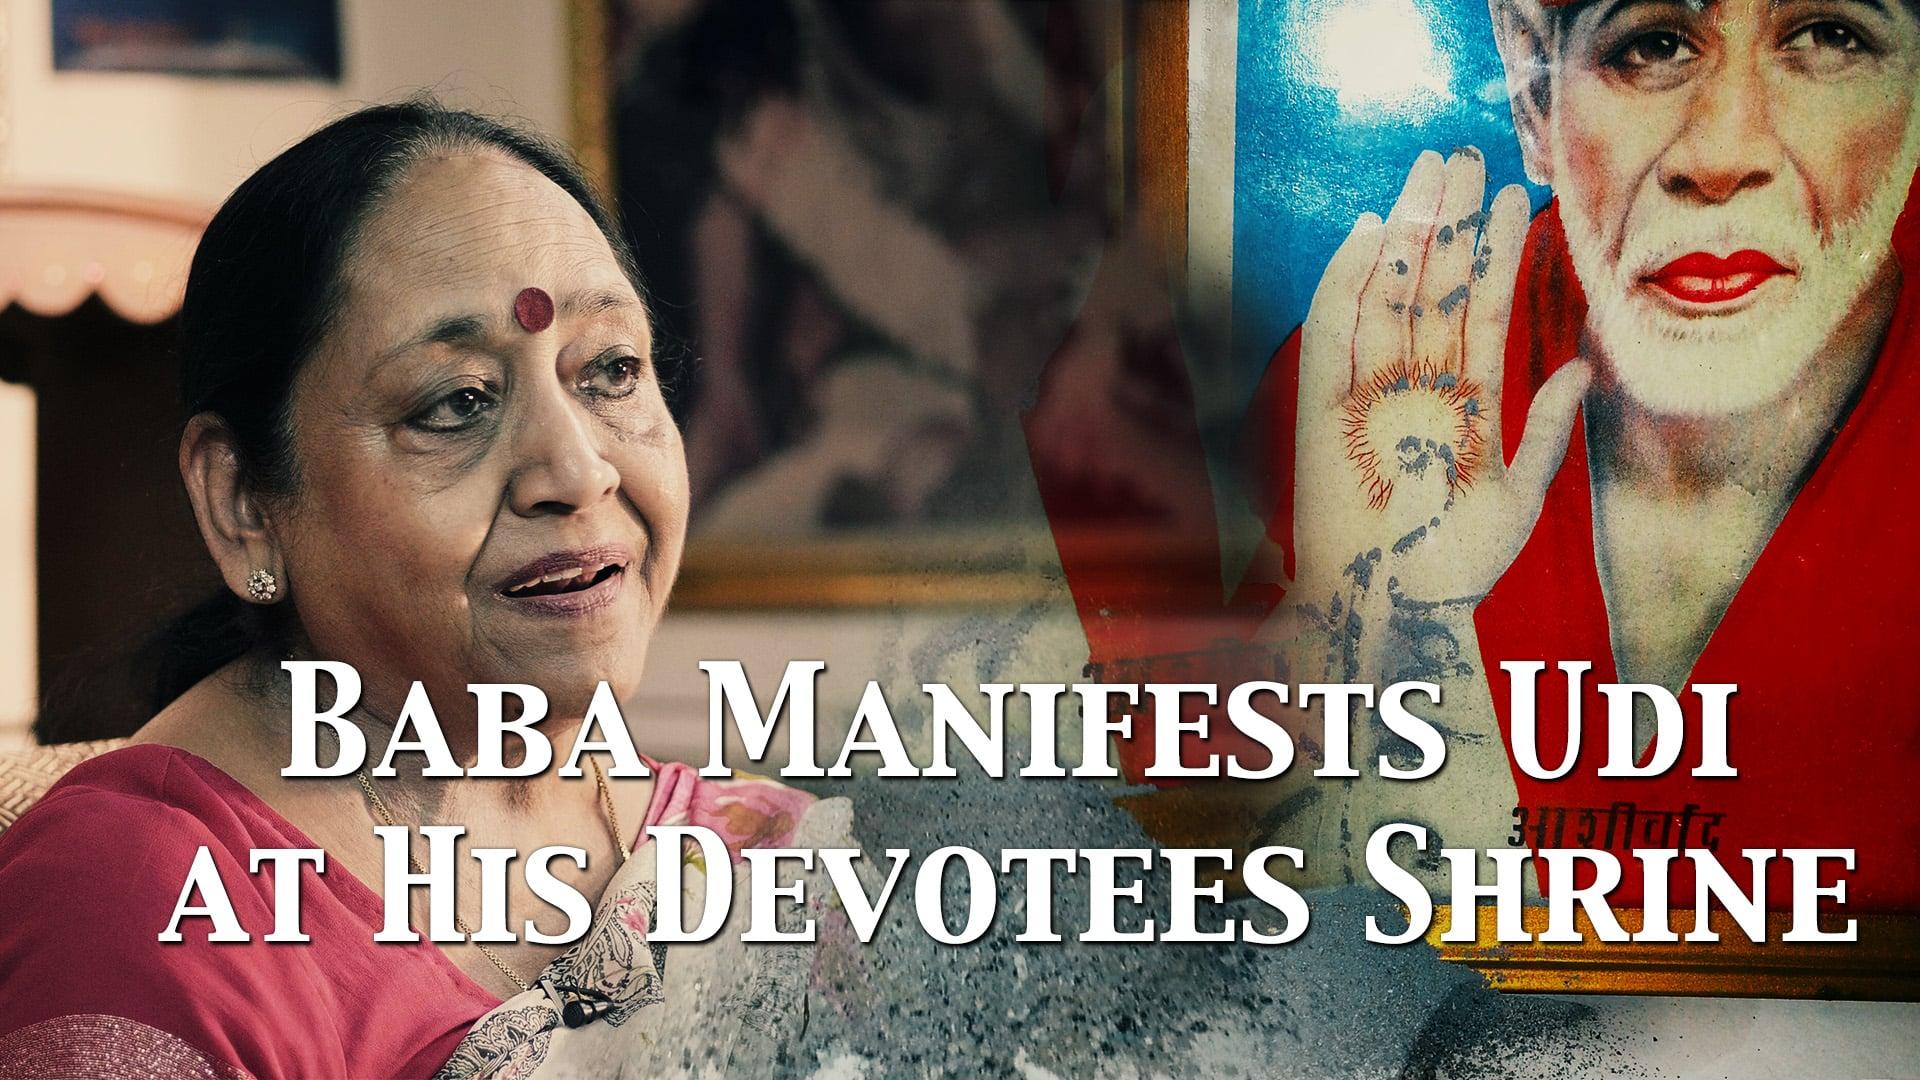 Baba manifests Udi at His devotee's shrine